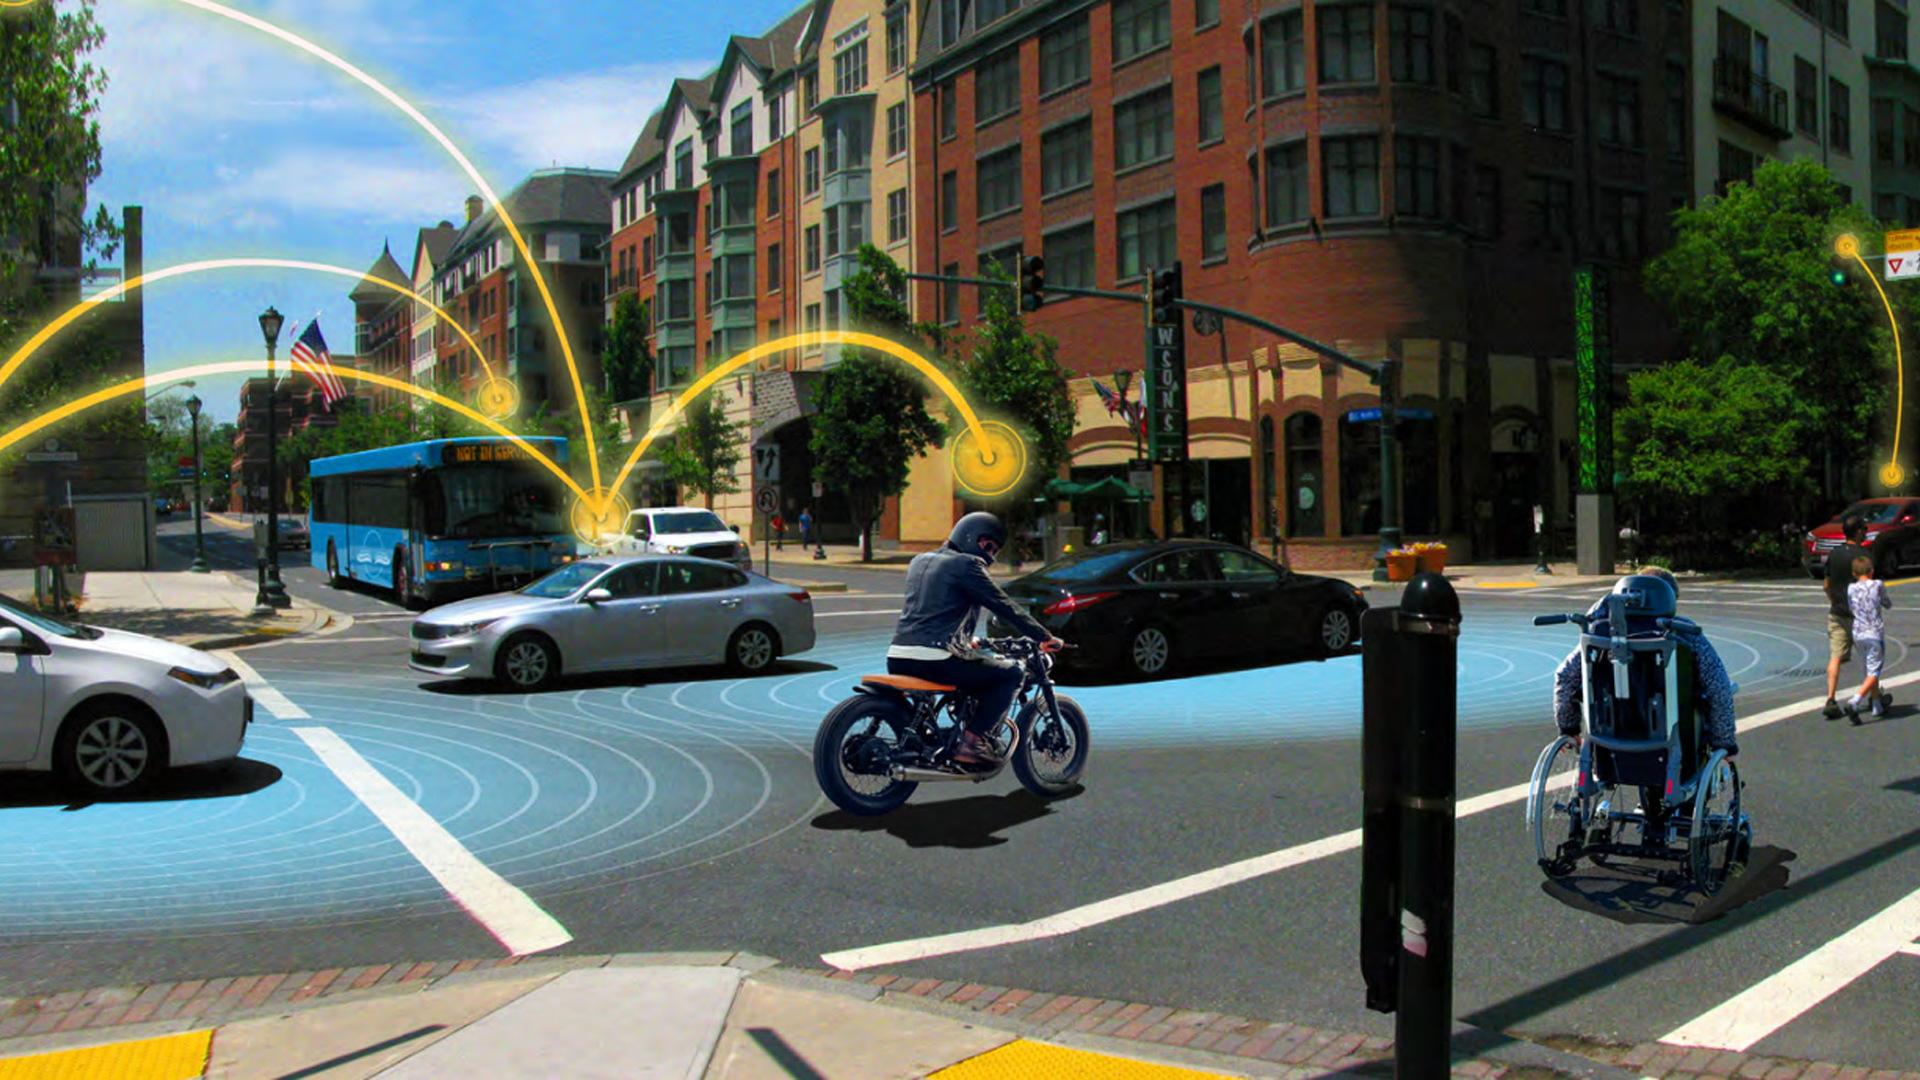 Vehicle-to-Vehicle (V2V) and Vehicle-to-Infrastructure (V2I) communications